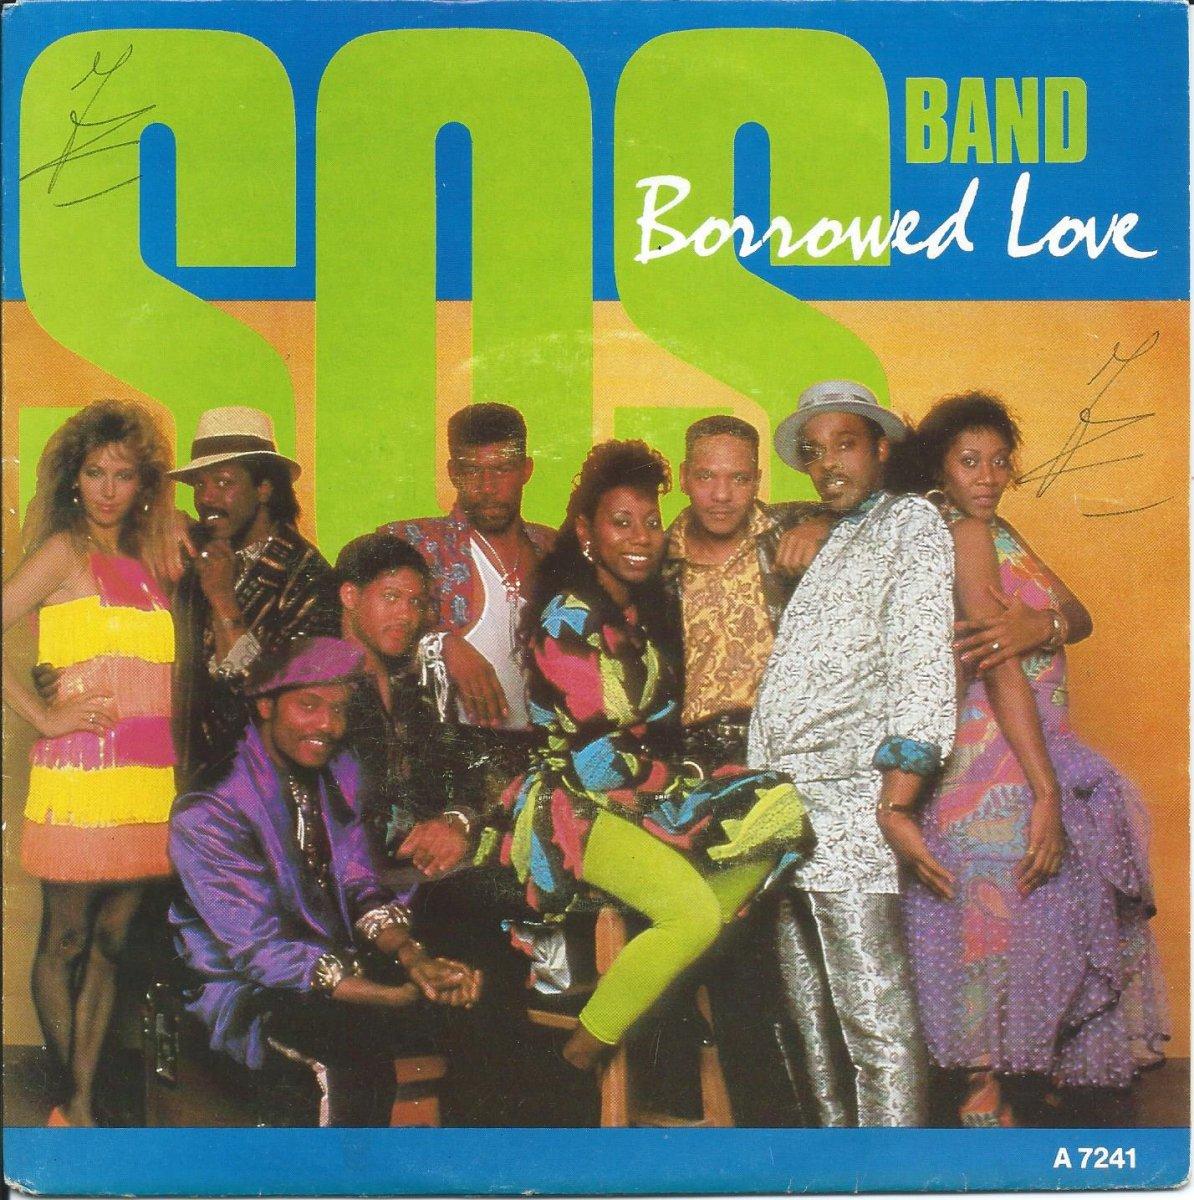 S.O.S. BAND / BORROWED LOVE / WEEKEND GIRL (7